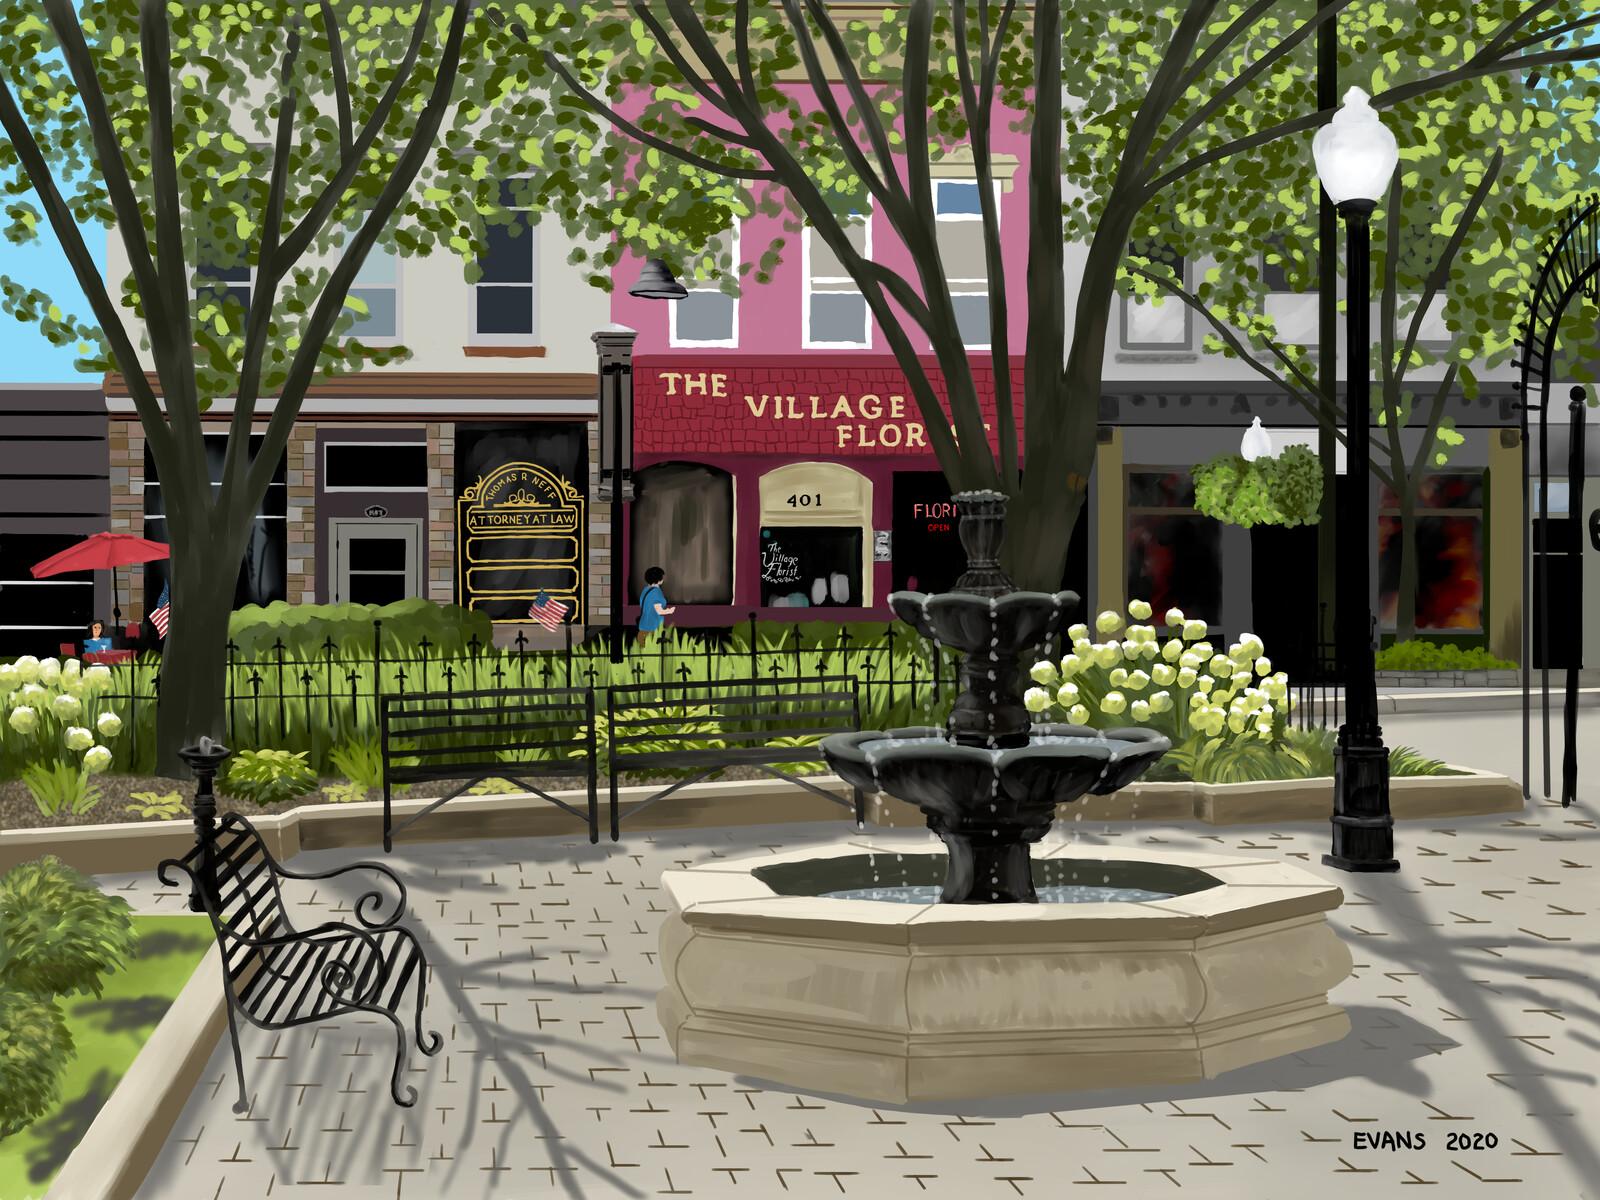 Milford Main Street 2020